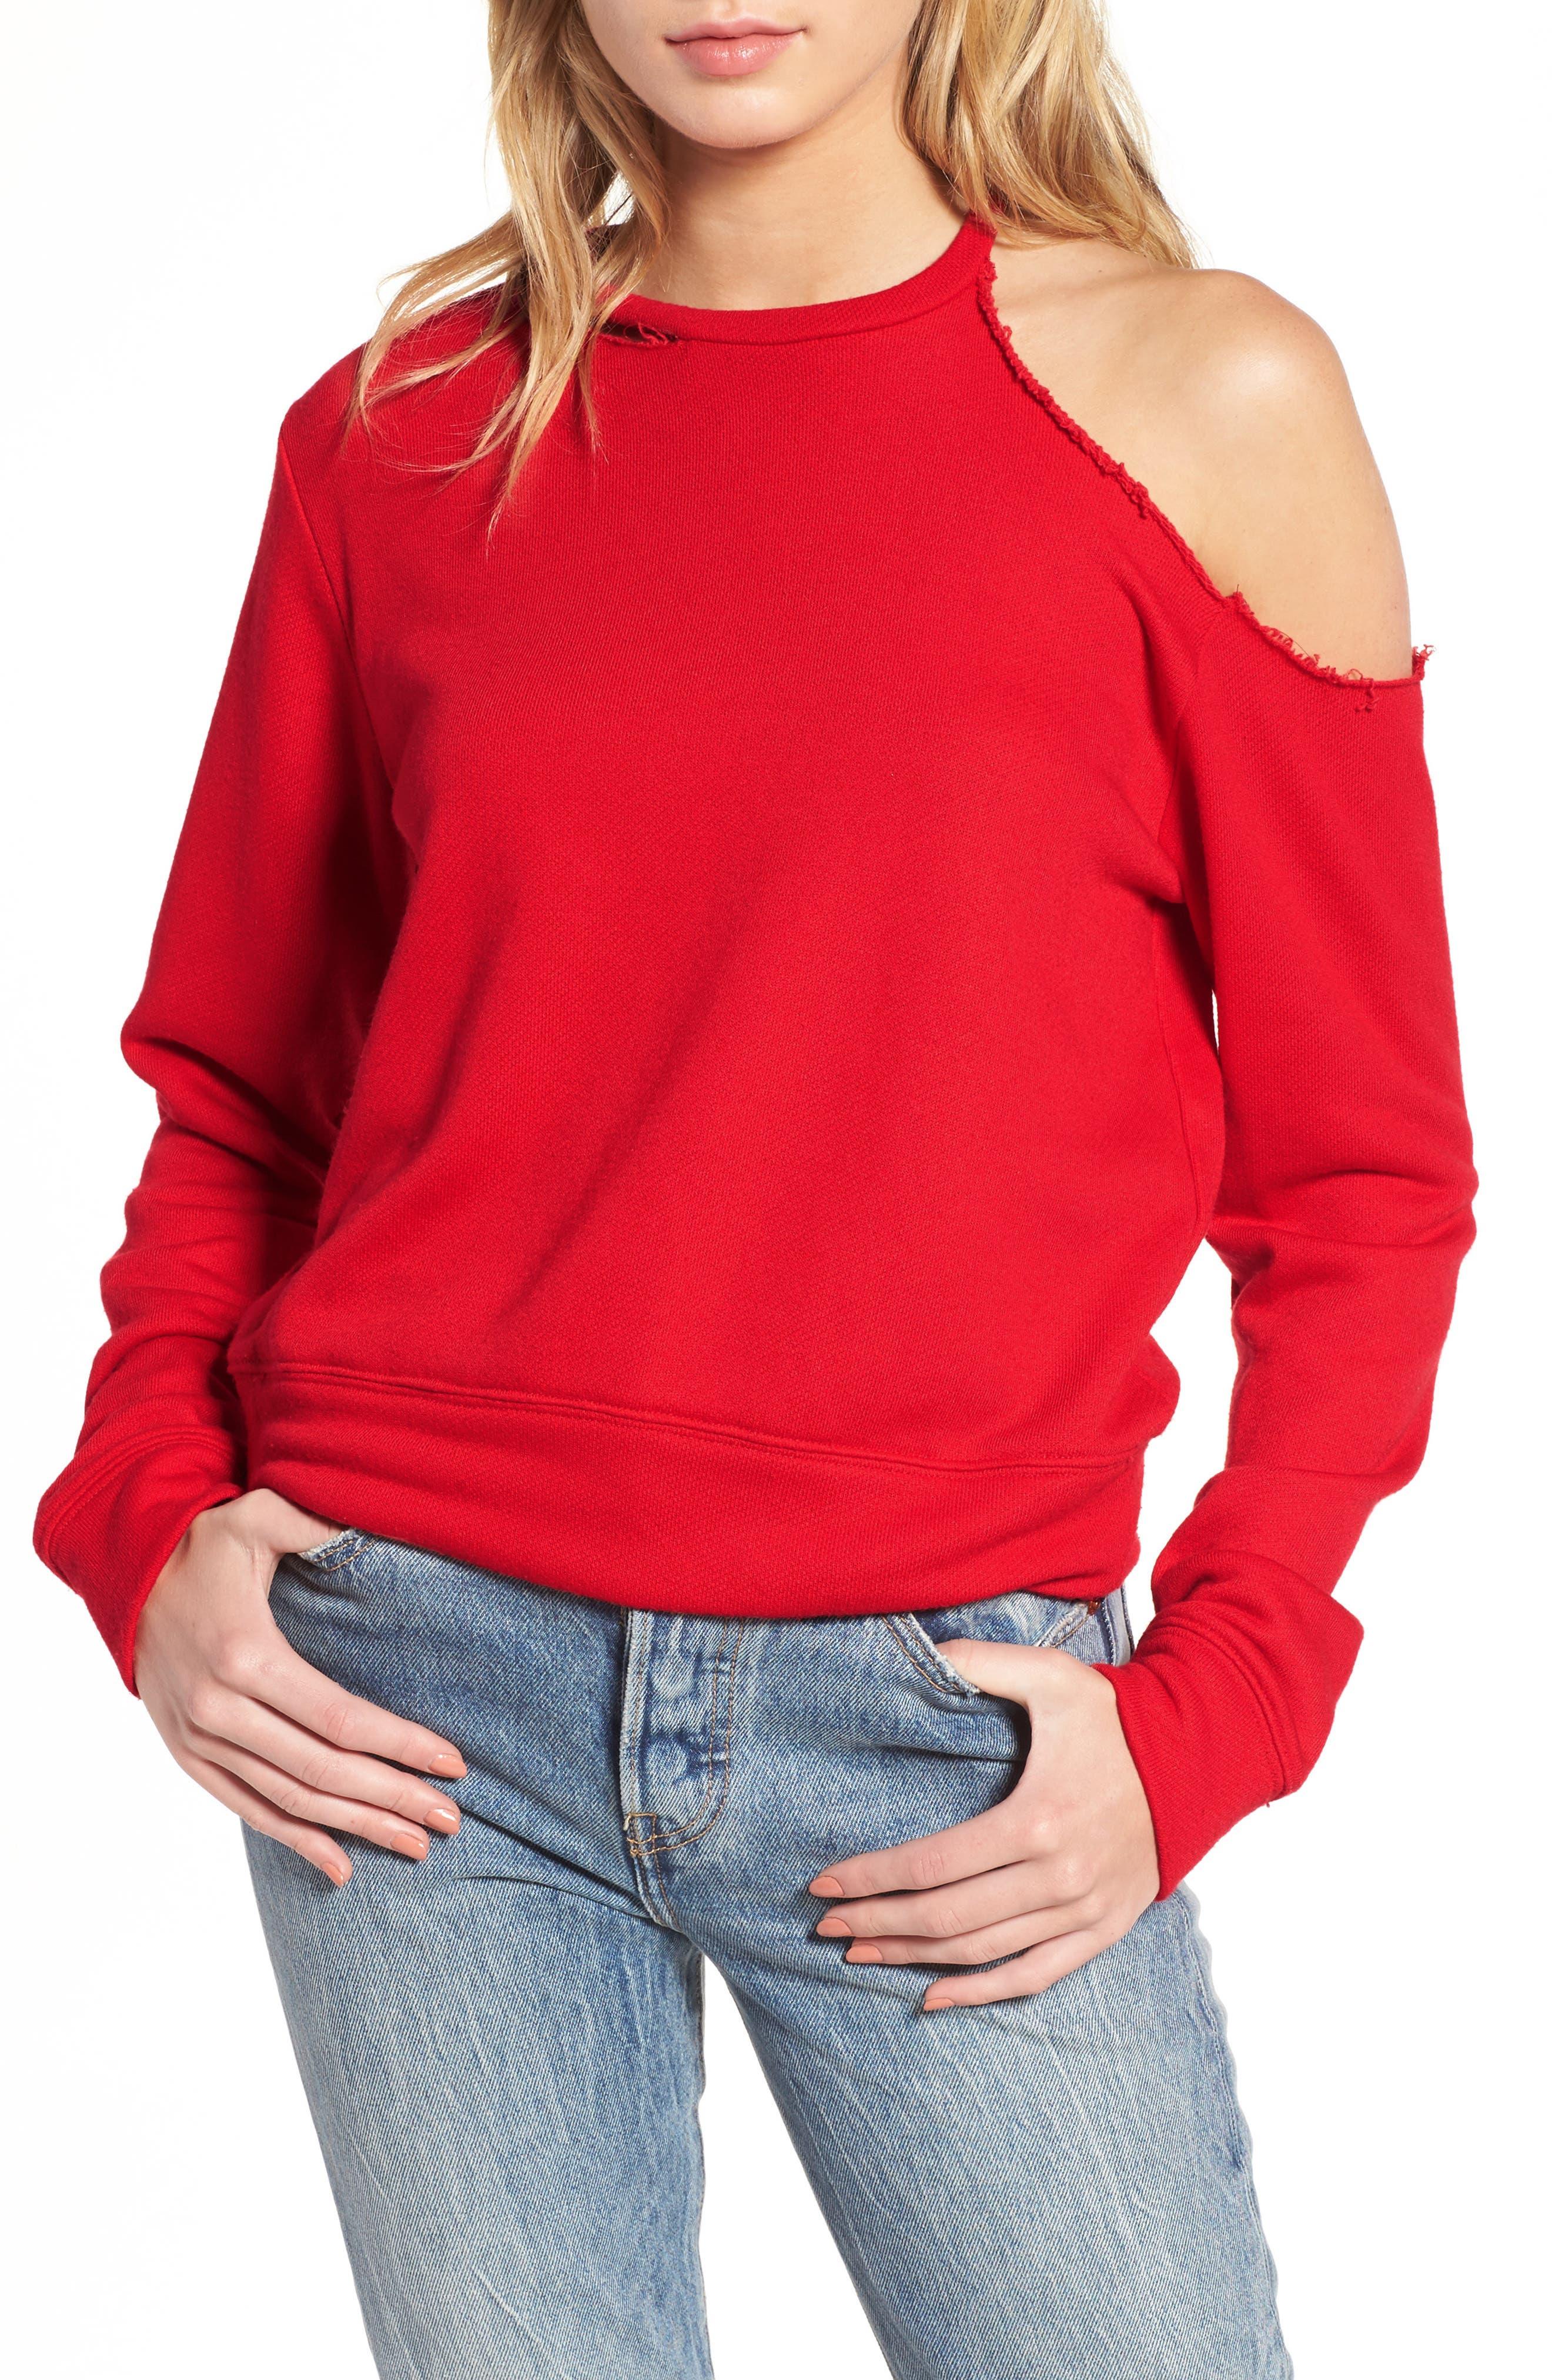 Mikko Distressed Cold Shoulder Sweatshirt,                         Main,                         color, 621